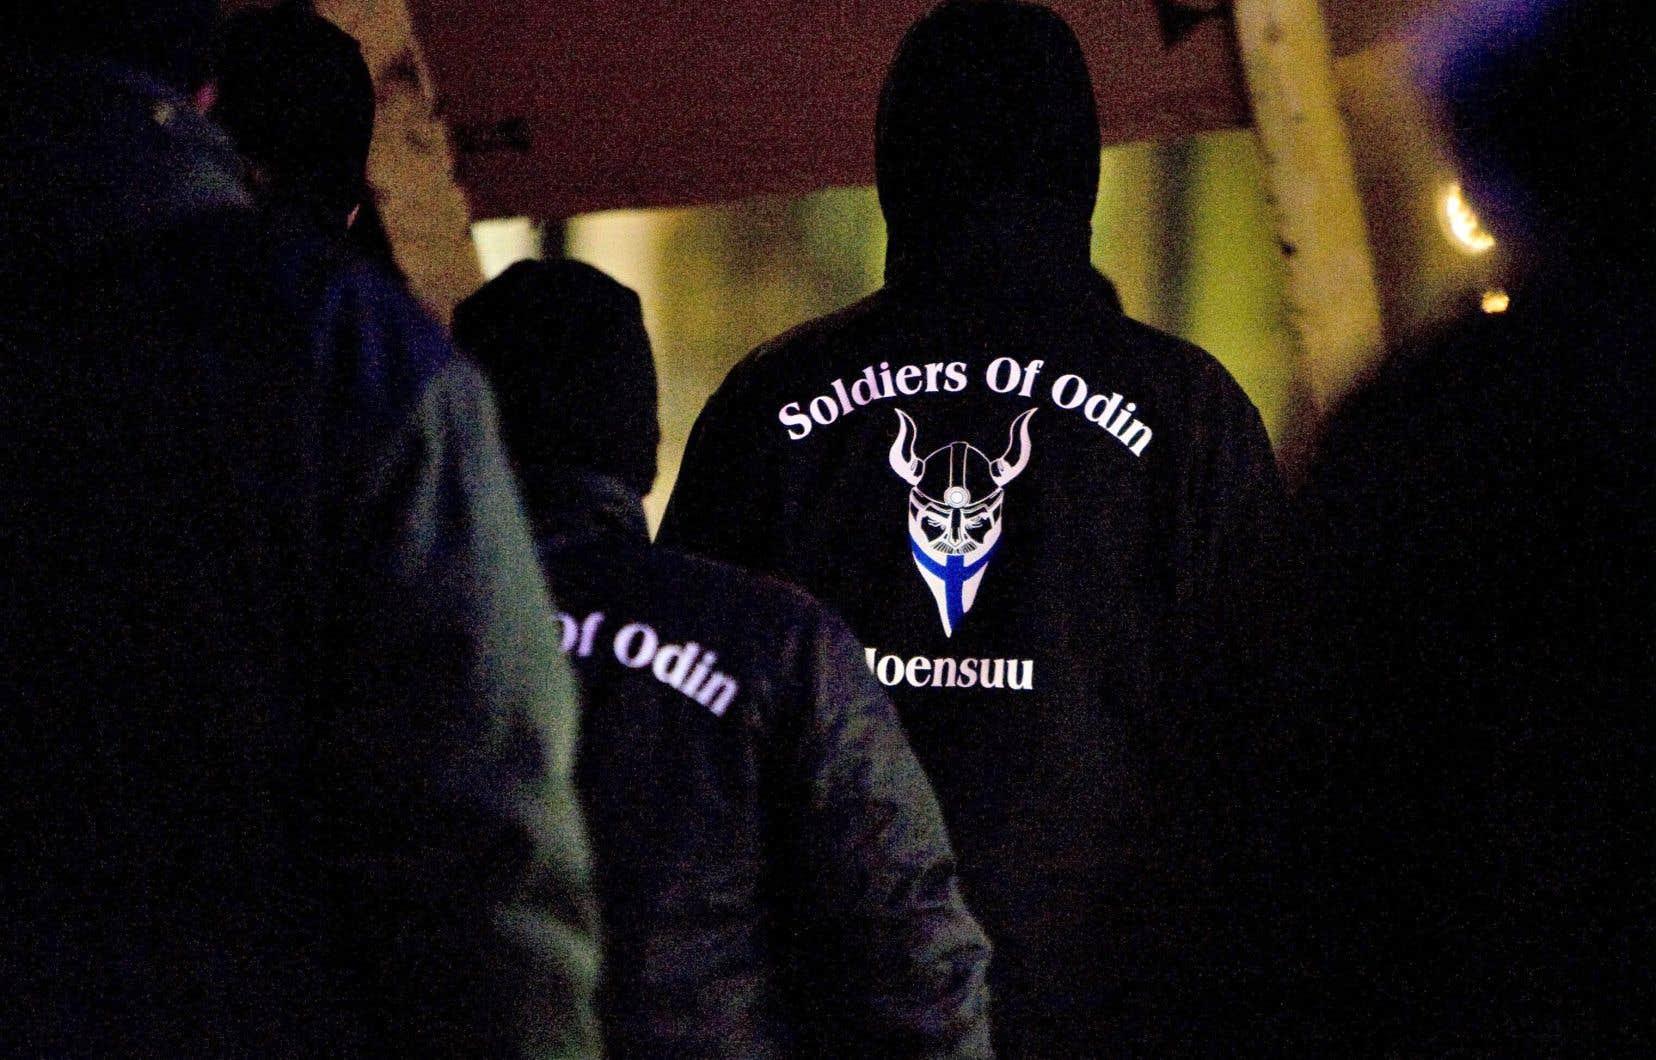 Des membres des Soldats d'Odin, en Finlande